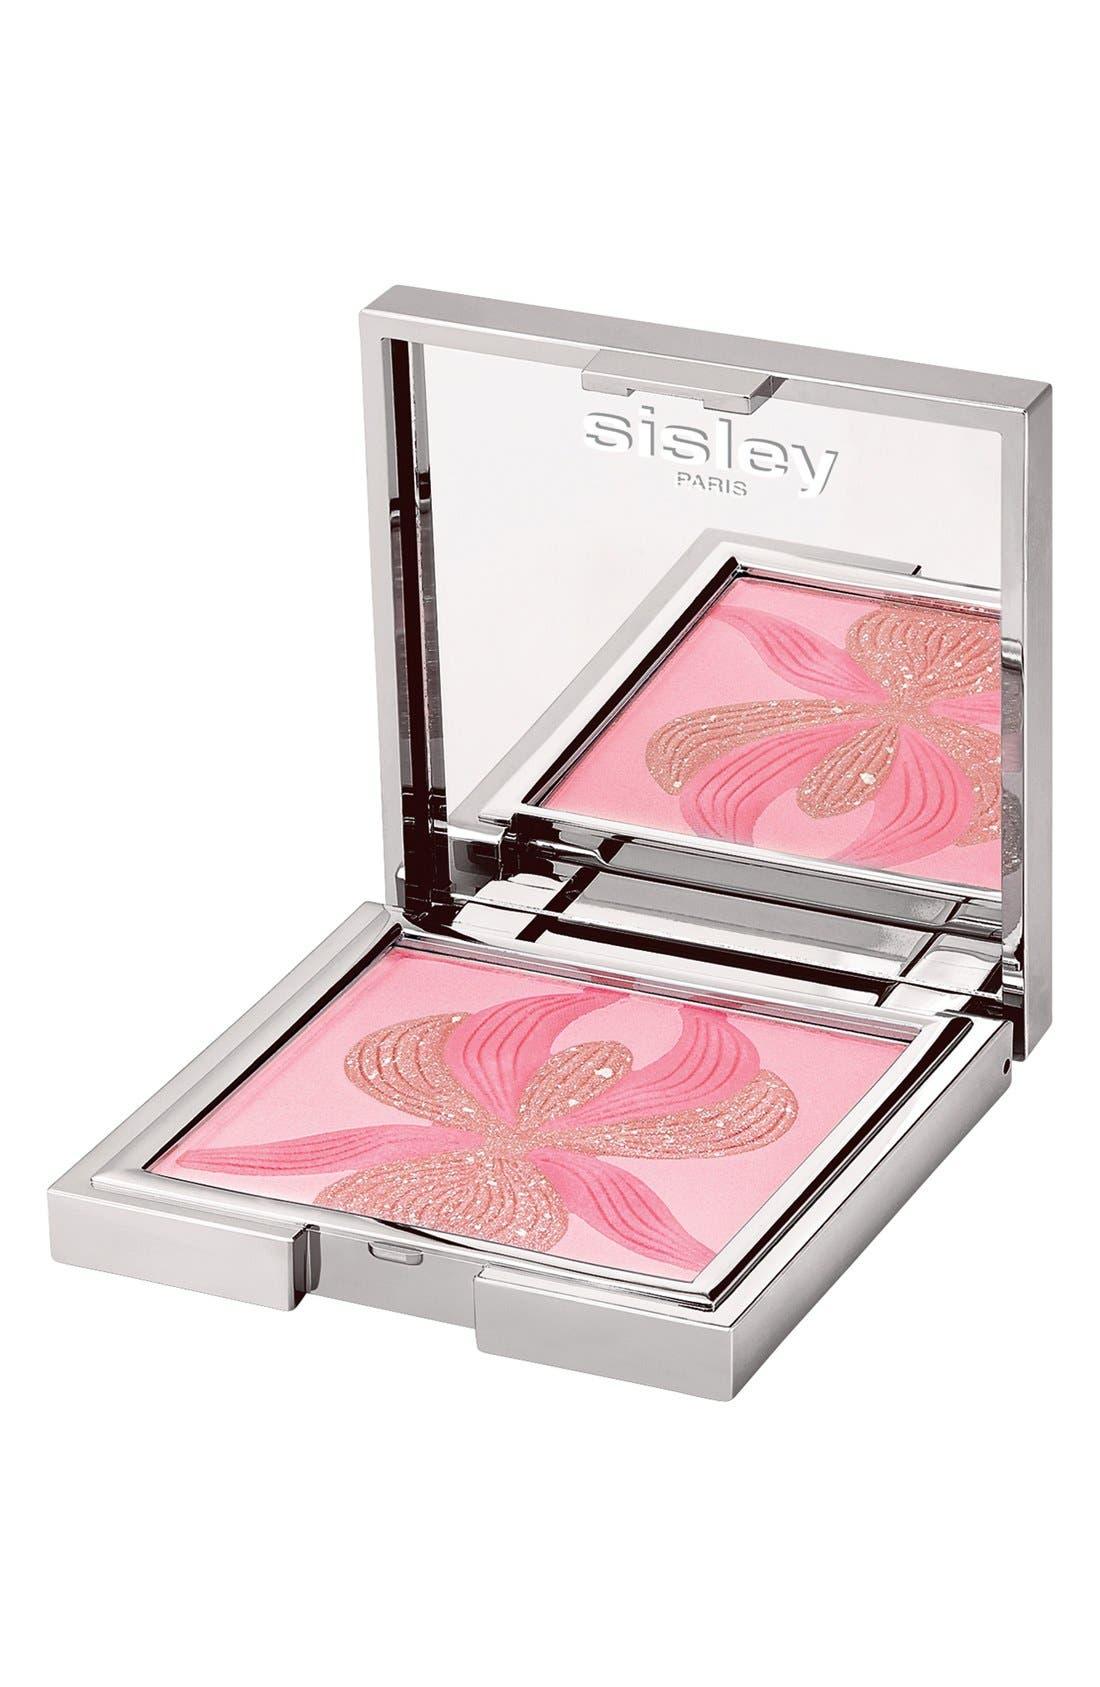 Sisley Paris LOrchidée Highlighter Blush